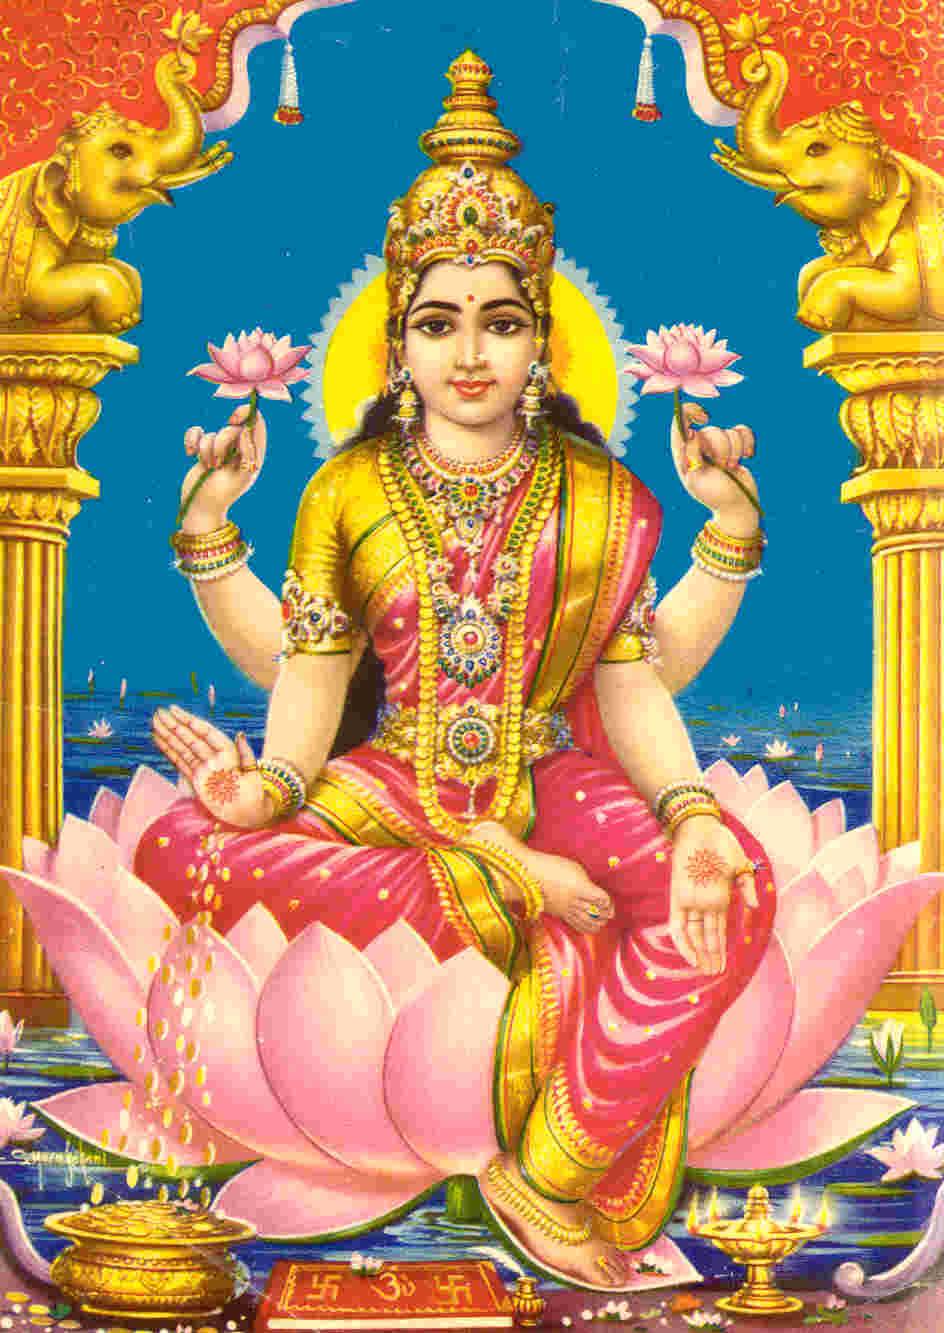 Lakshmi, Goddess of Abundance, Prosperity and Manifestation